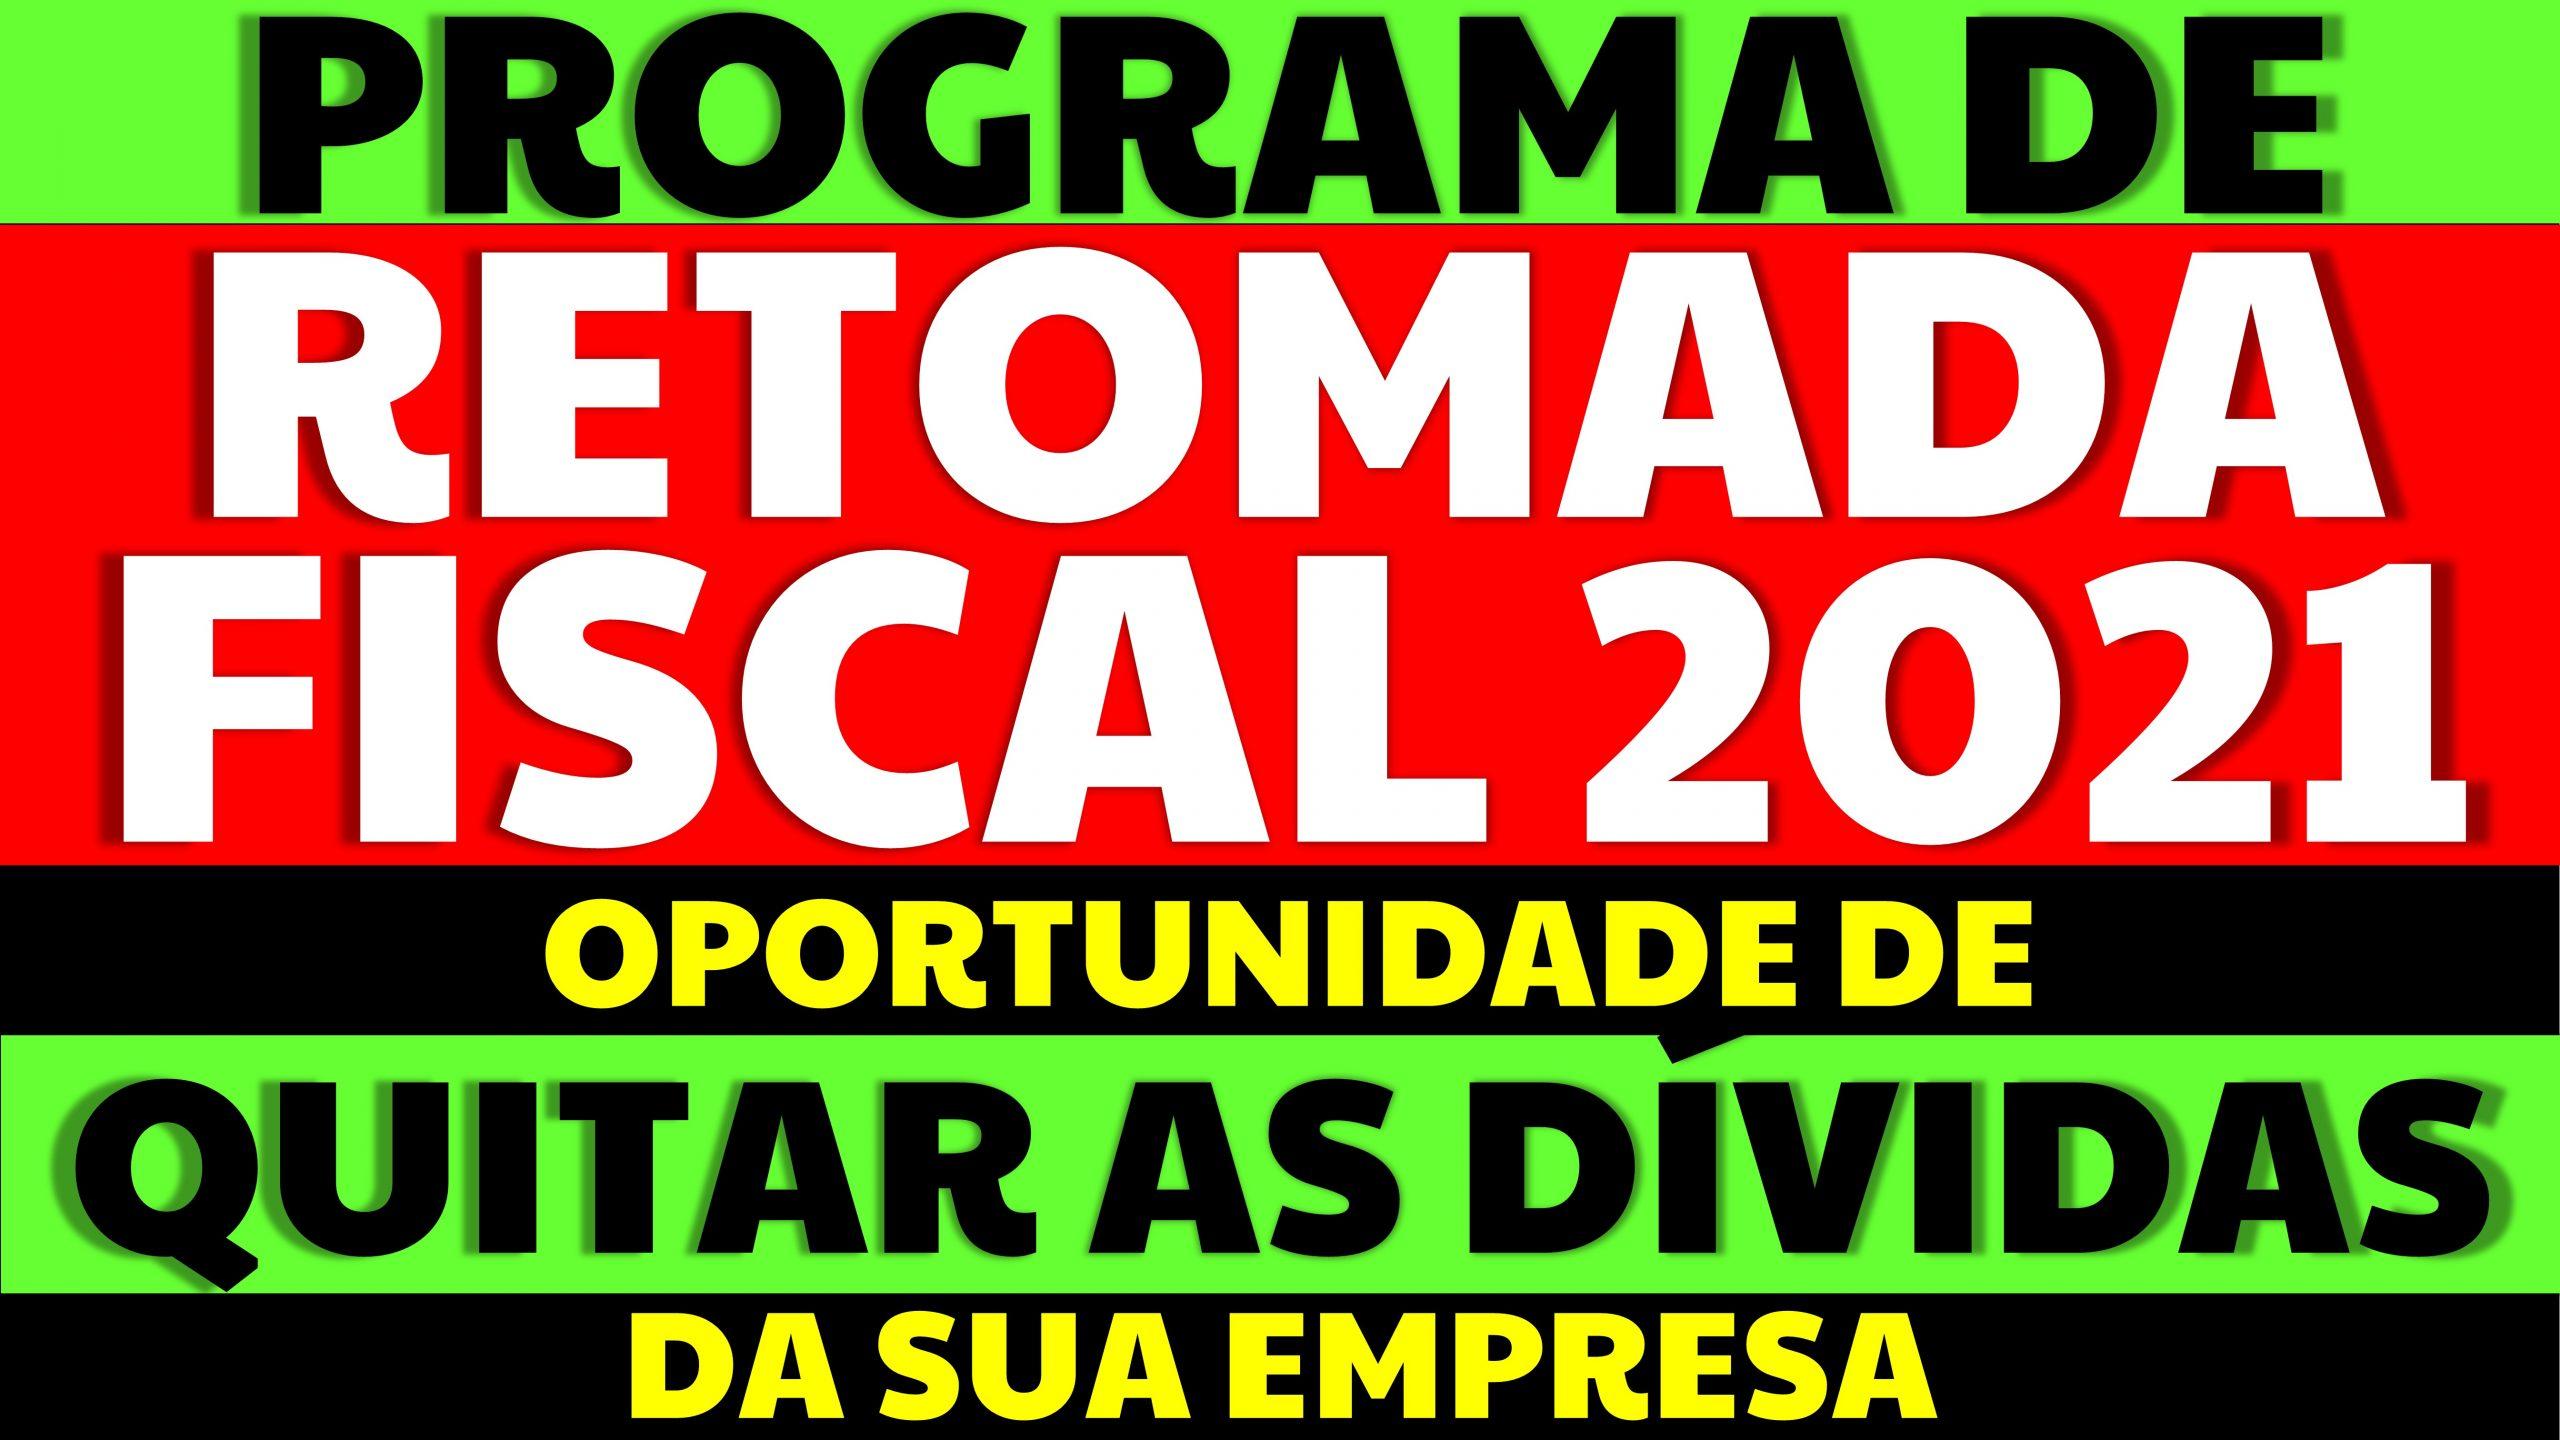 Programa de Retomada Fiscal